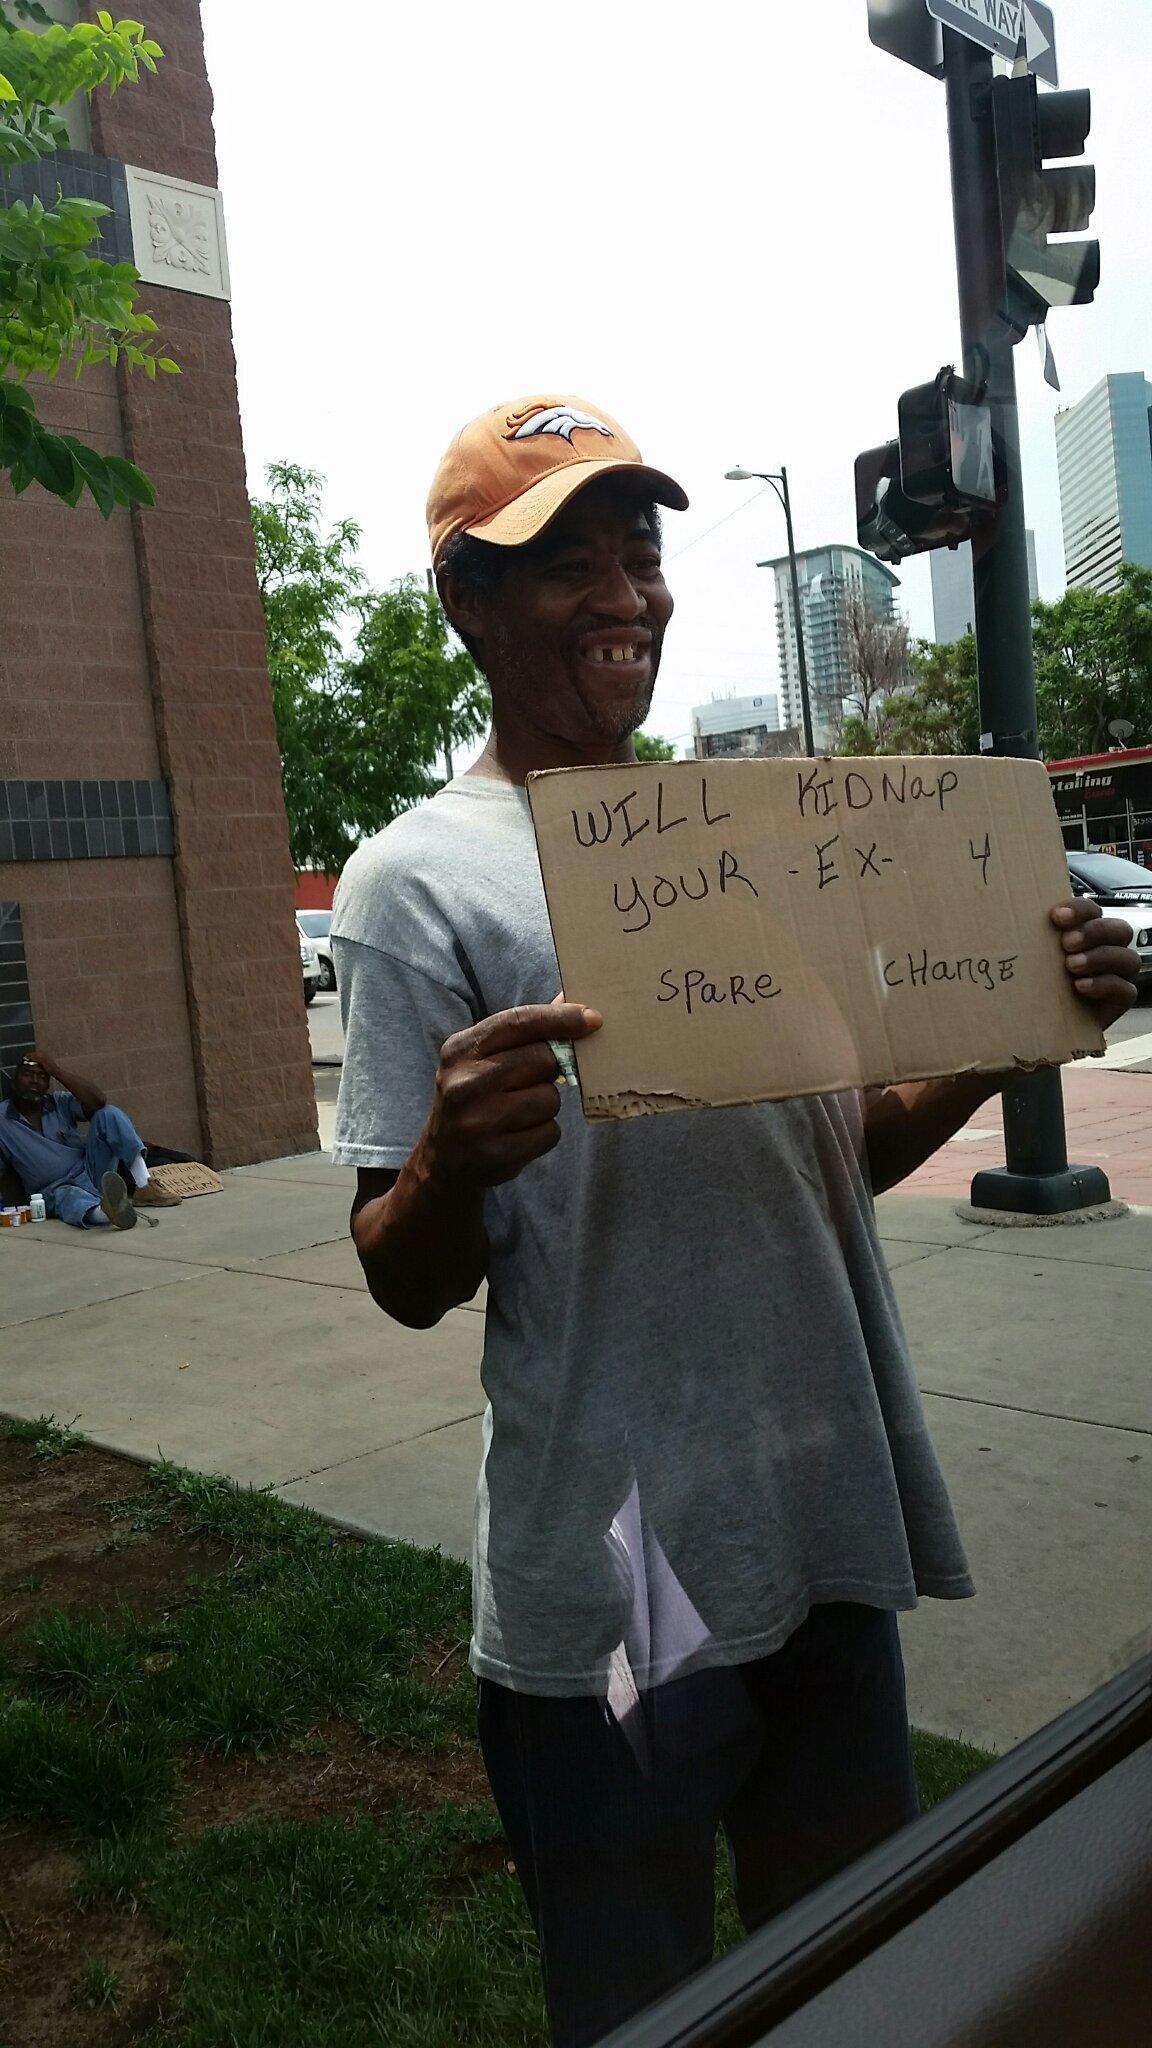 Cool homeless dude is cool - meme